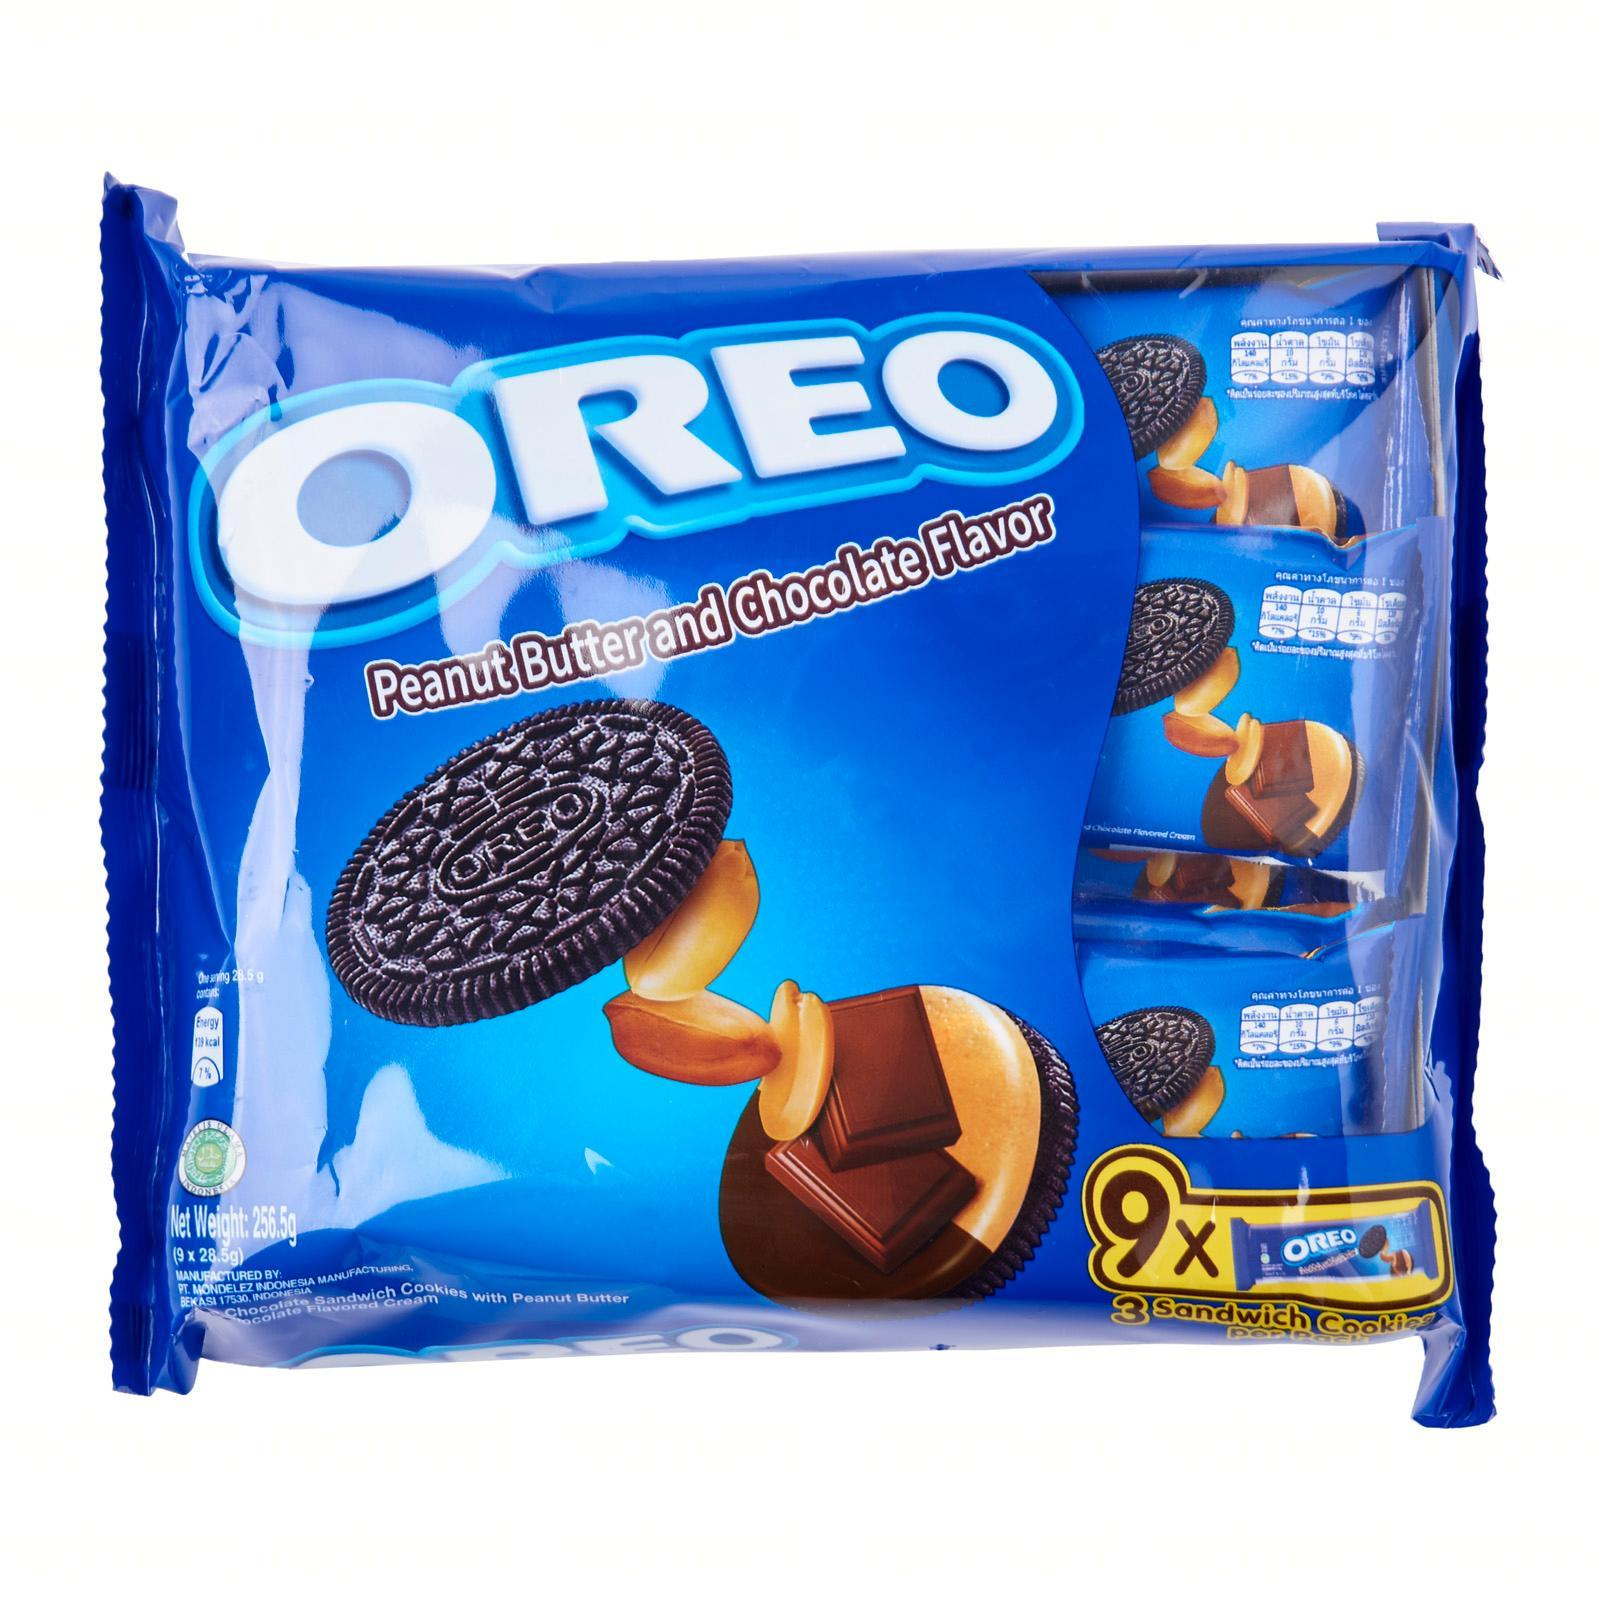 OREO Chocolate Sandwich Cookies - Peanut Butter 9sX29.4g